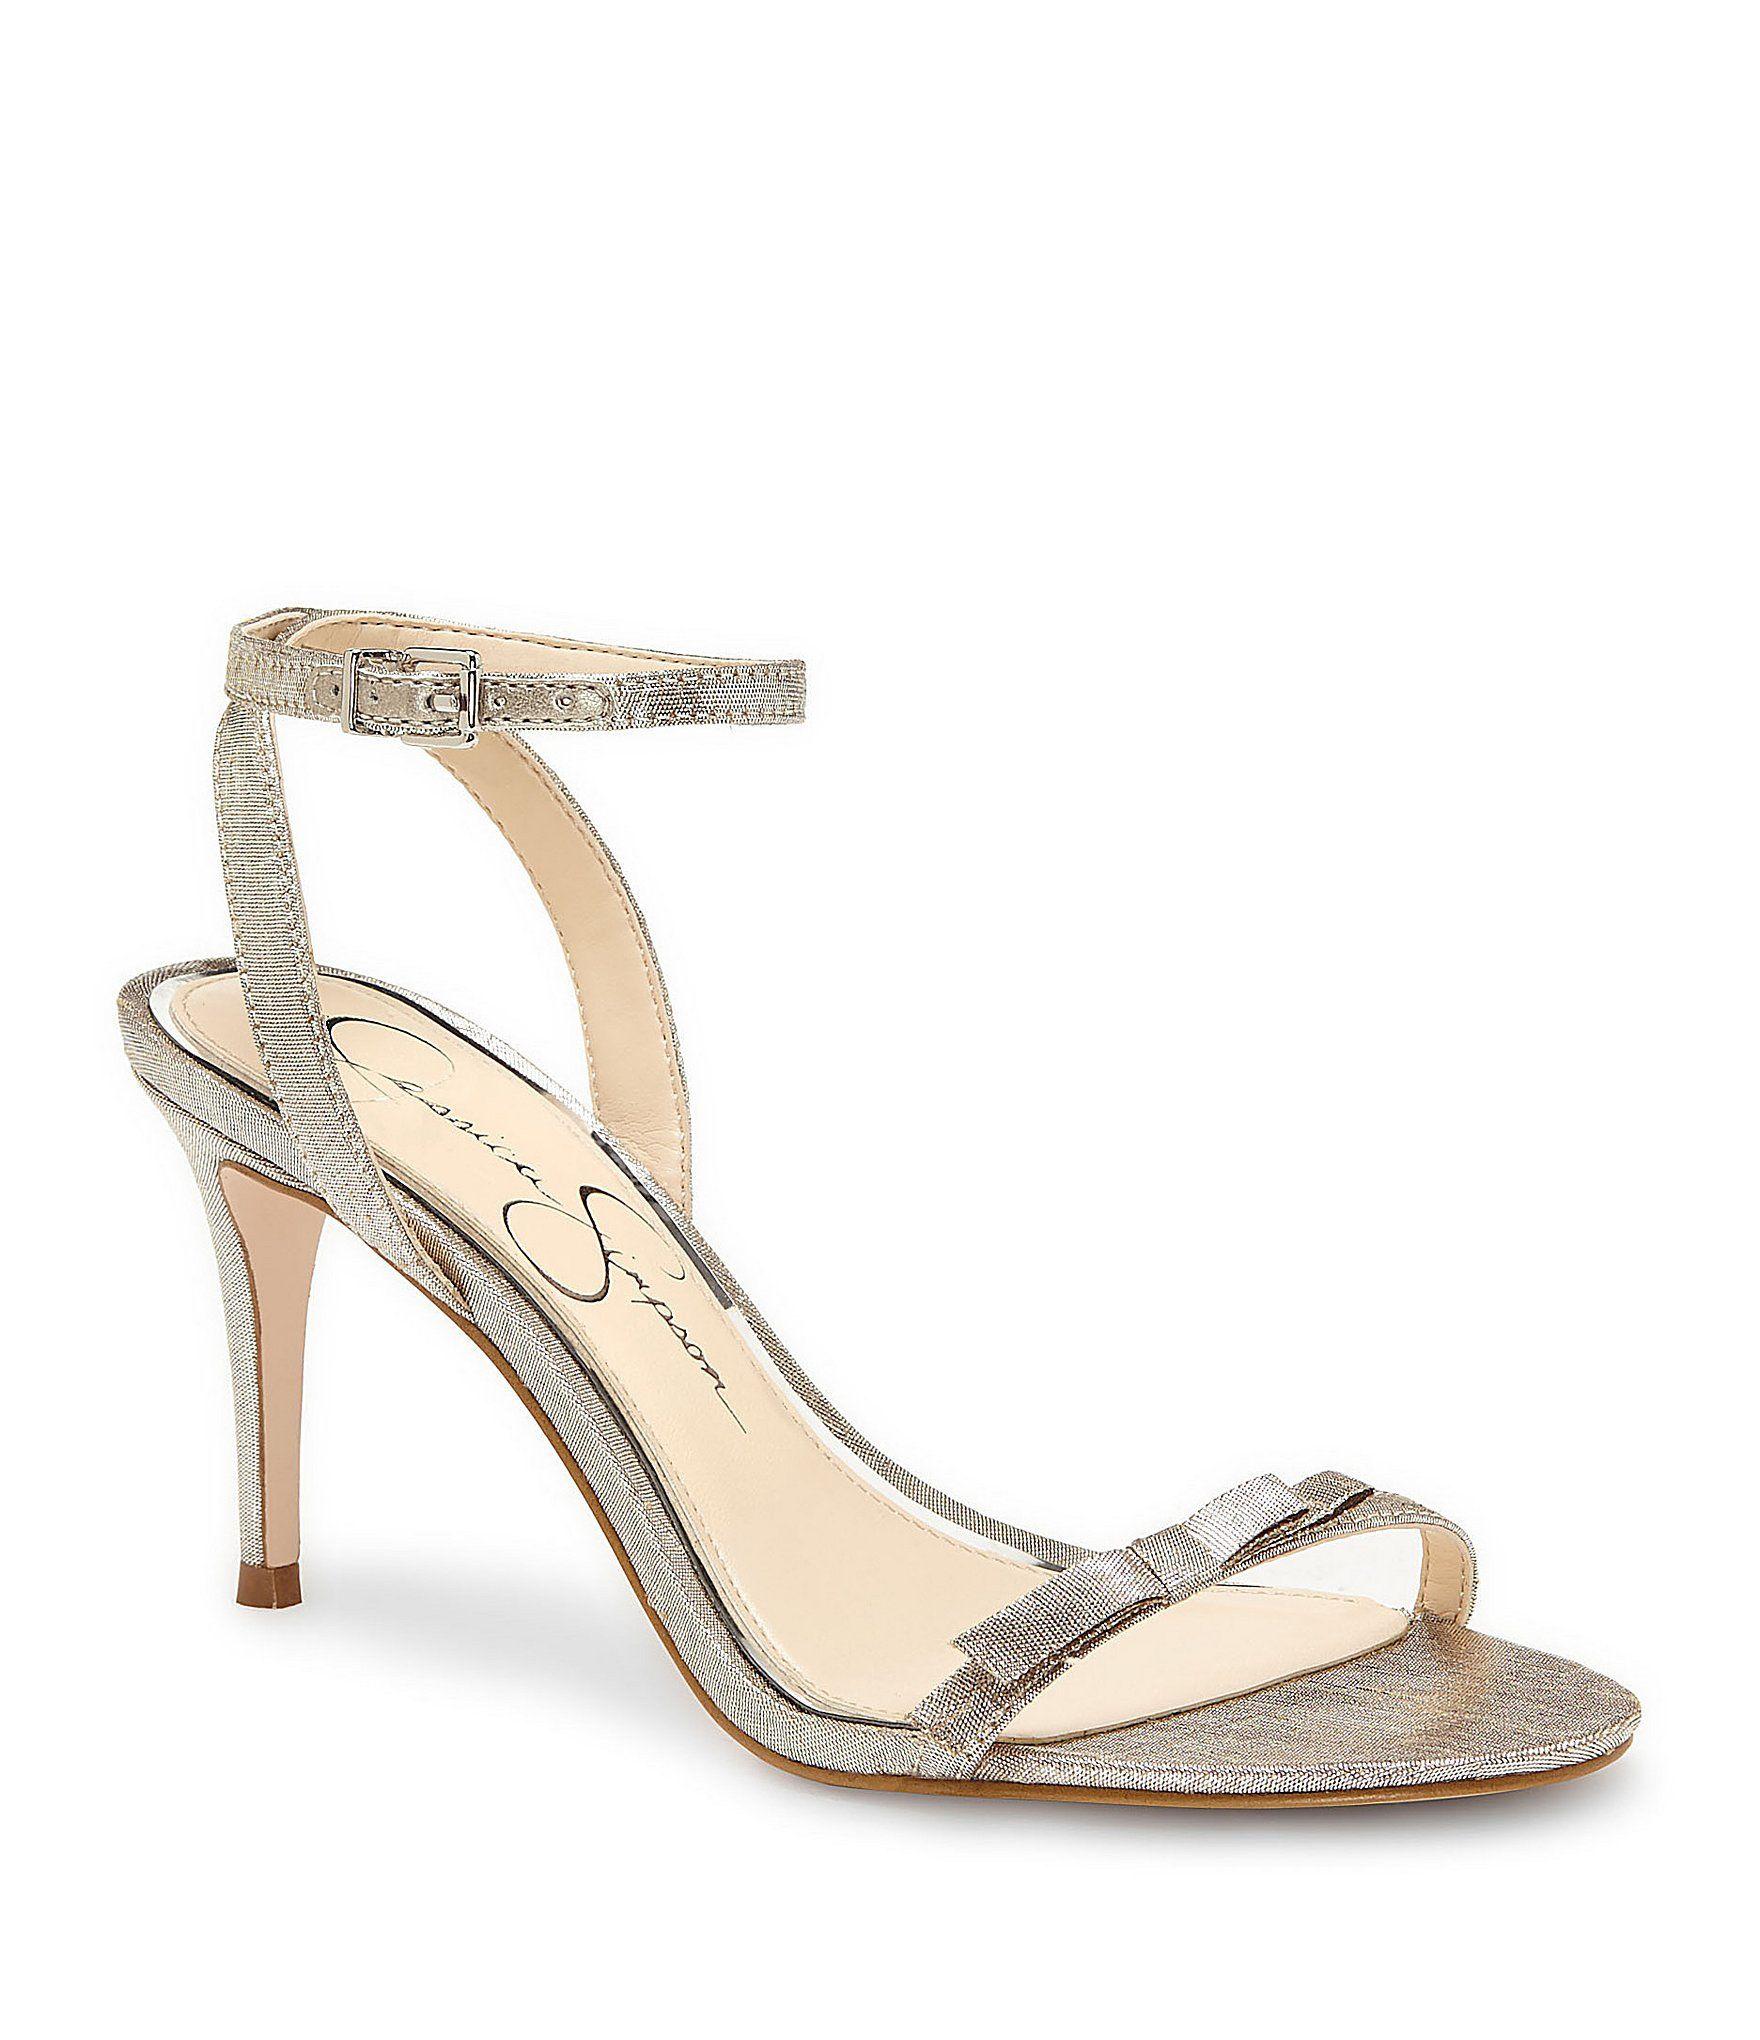 Jessica Simpson Purella Suede Ankle Strap Sandals dSOmH0bNjw